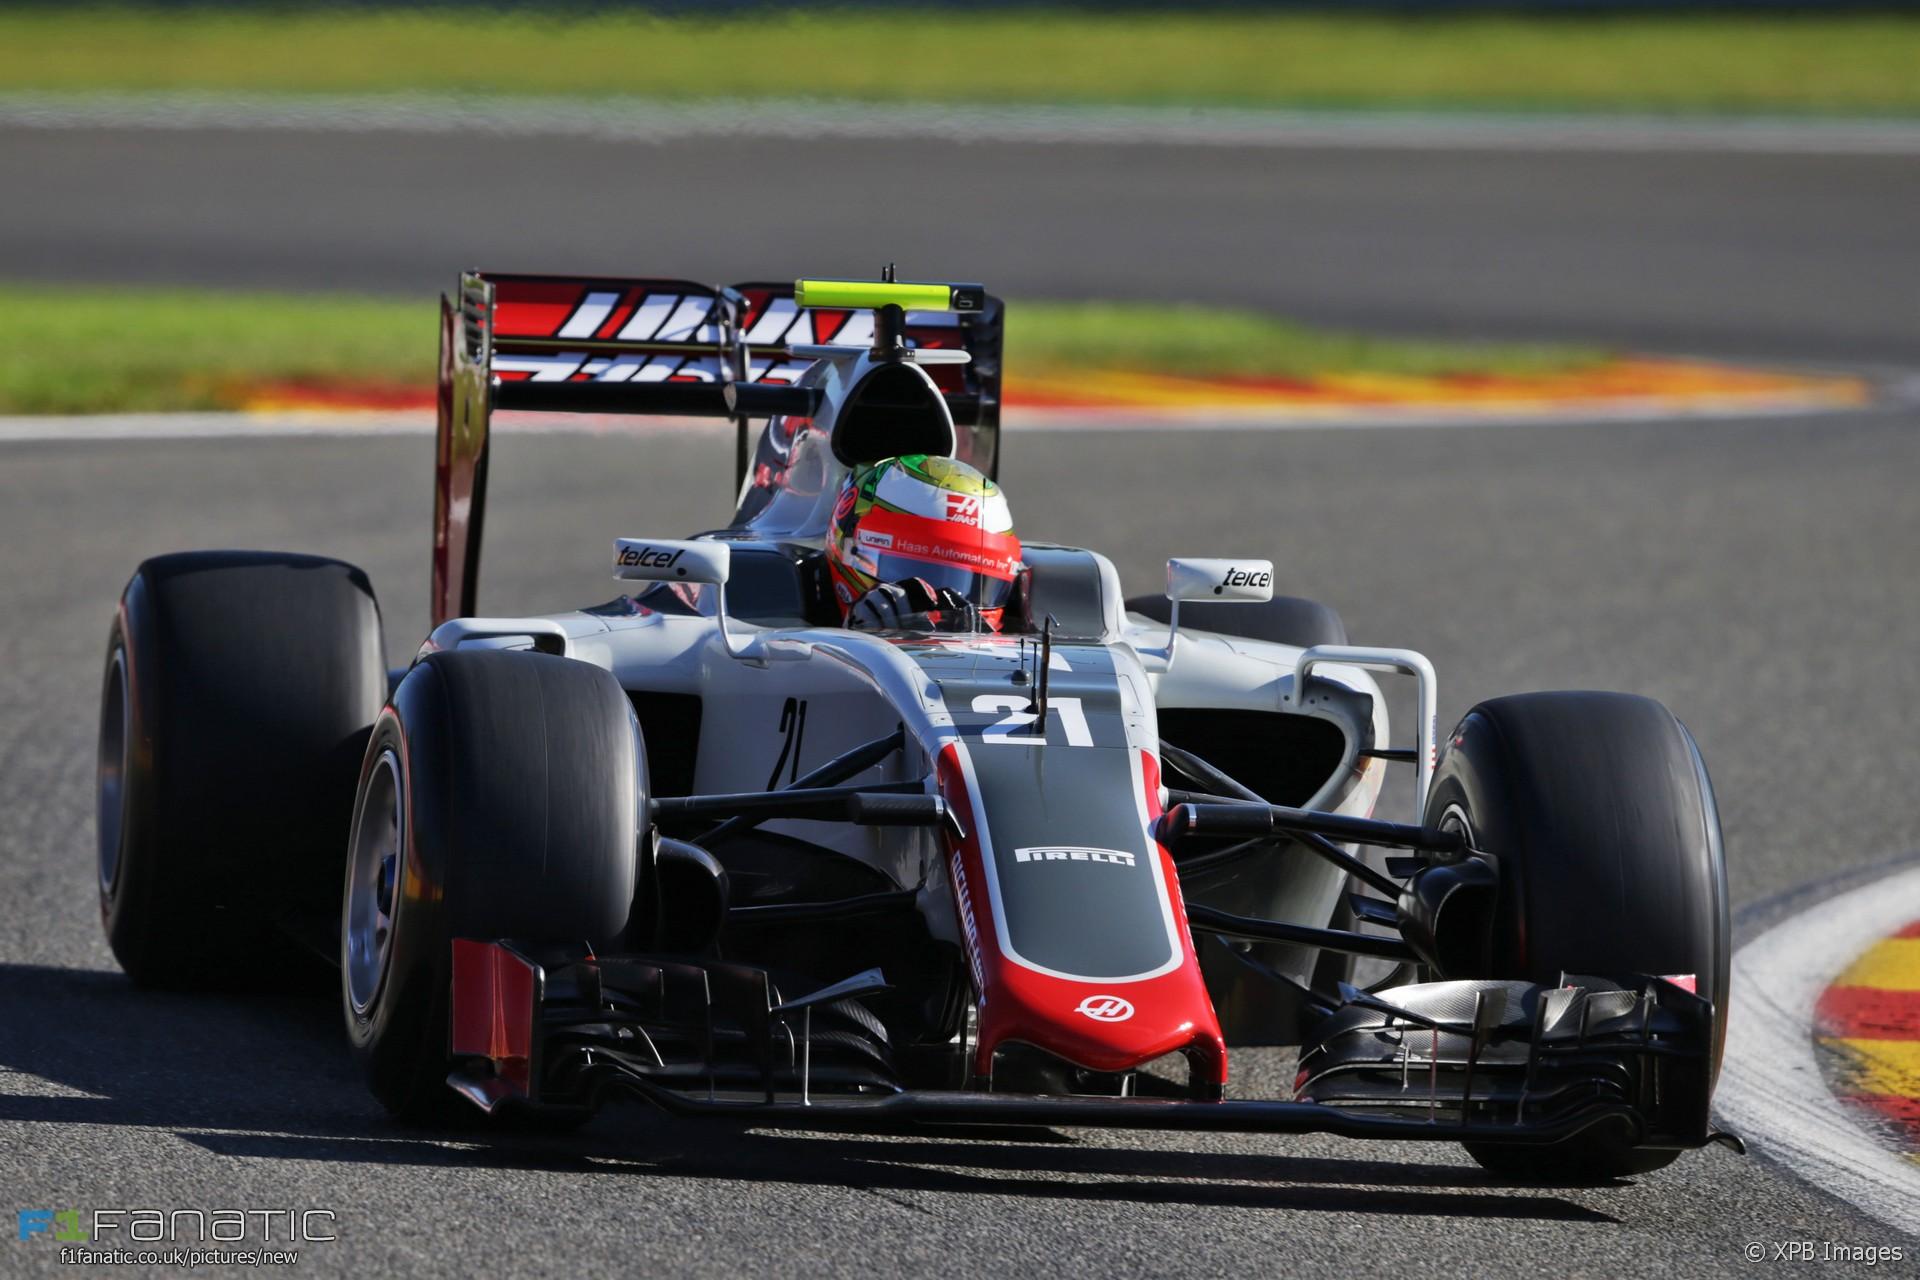 Esteban Gutierrez, Haas, Spa-Francorchamps, 2016